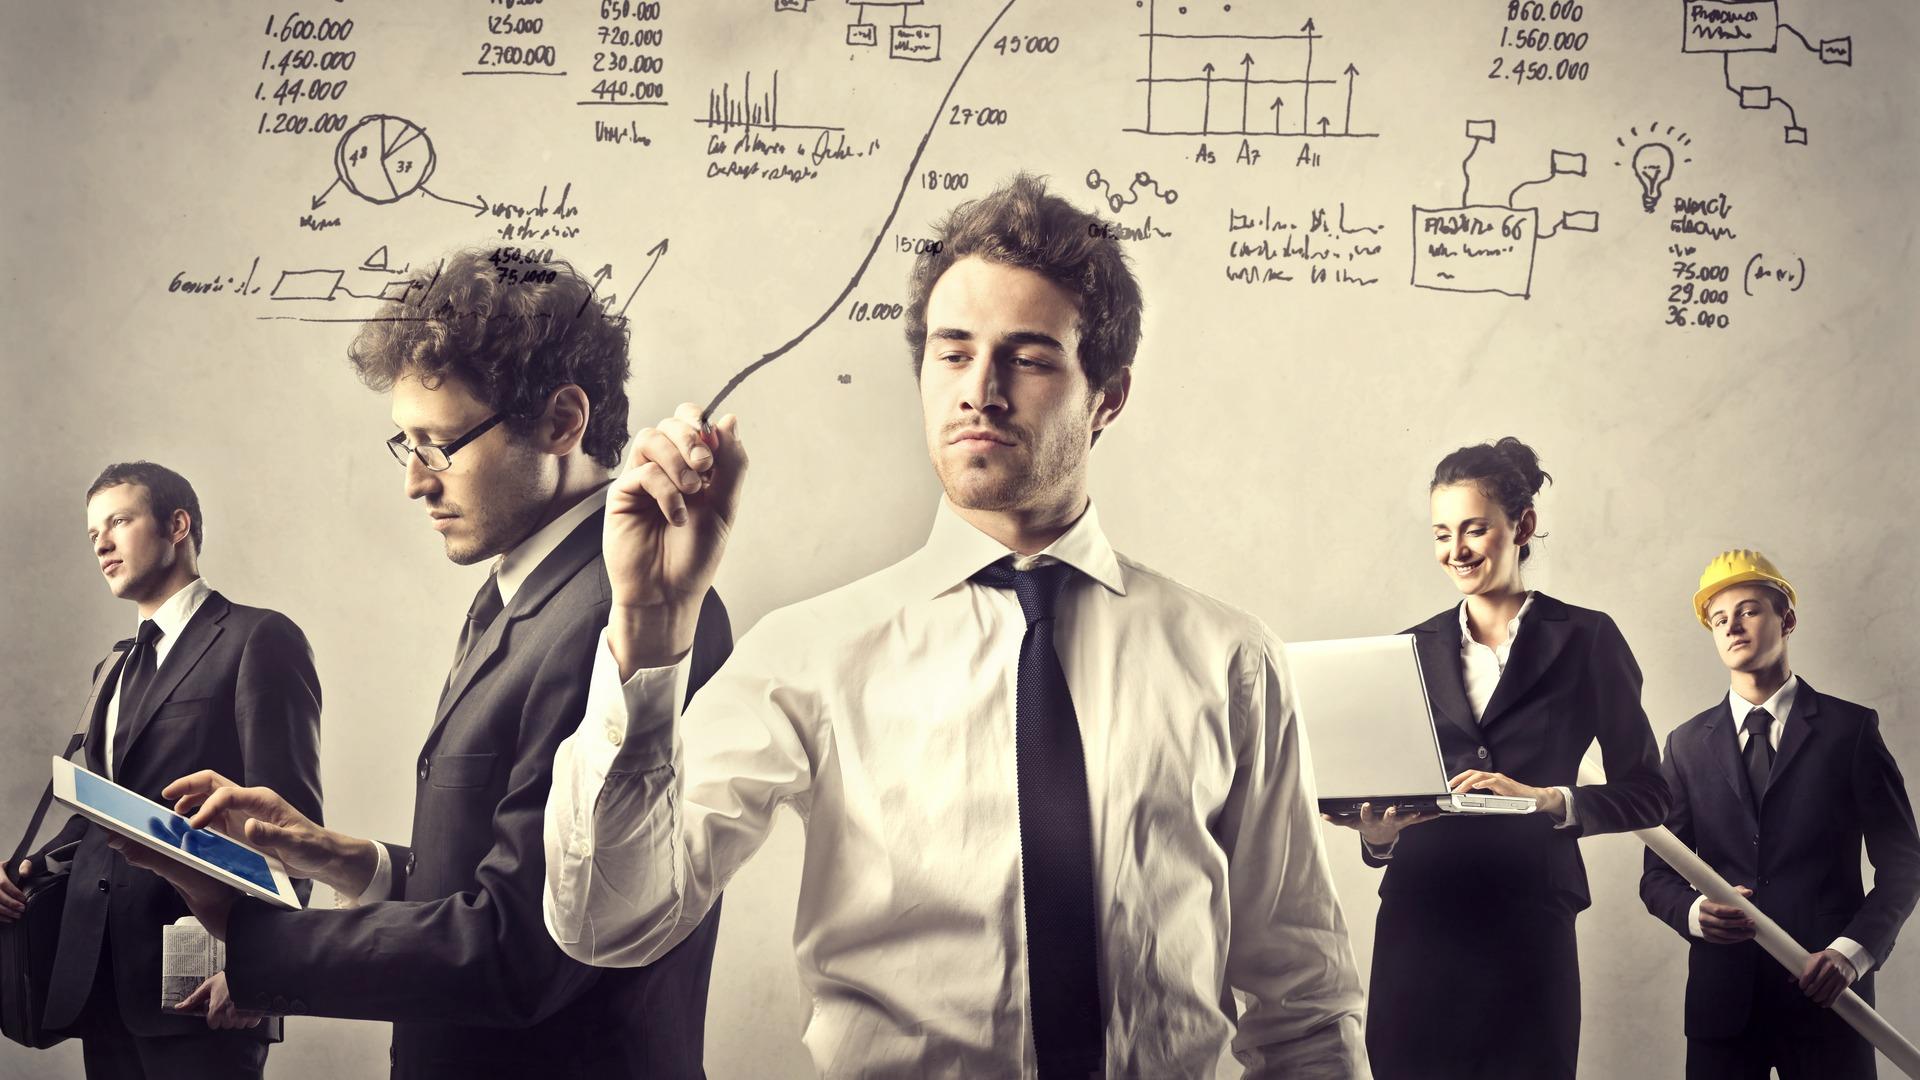 www.elmema.com / / بازاریابی و فروش و مدیریت / گروه آموزشی علم ما